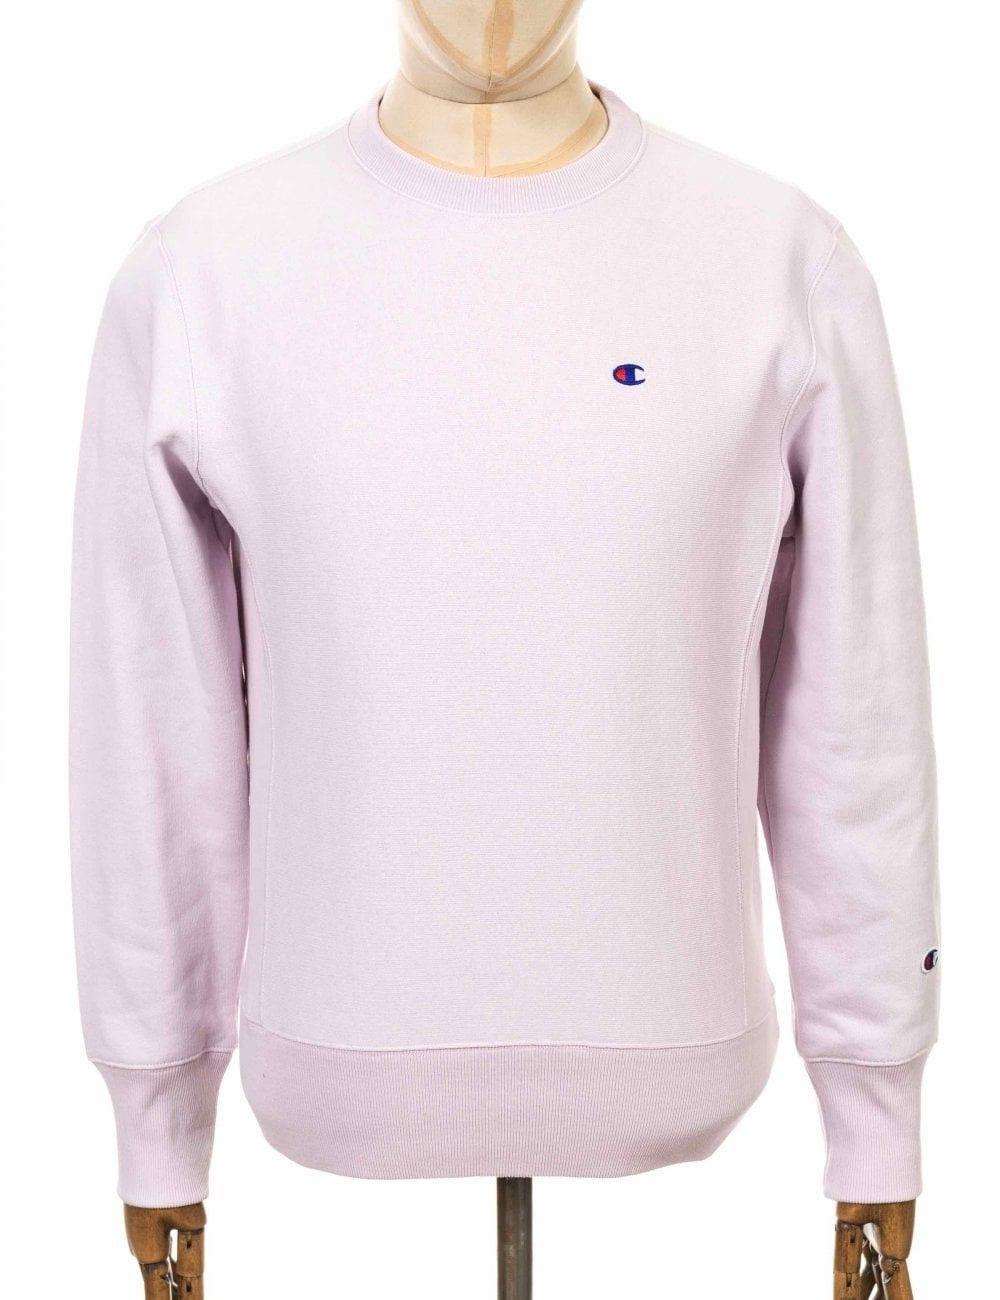 Champion Reverse Weave Crewneck Sweatshirt Lvf Lavender Colour Lvf Champion Cloth Sweatshirts Crew Neck Sweatshirt Champion Reverse Weave [ 1300 x 1000 Pixel ]